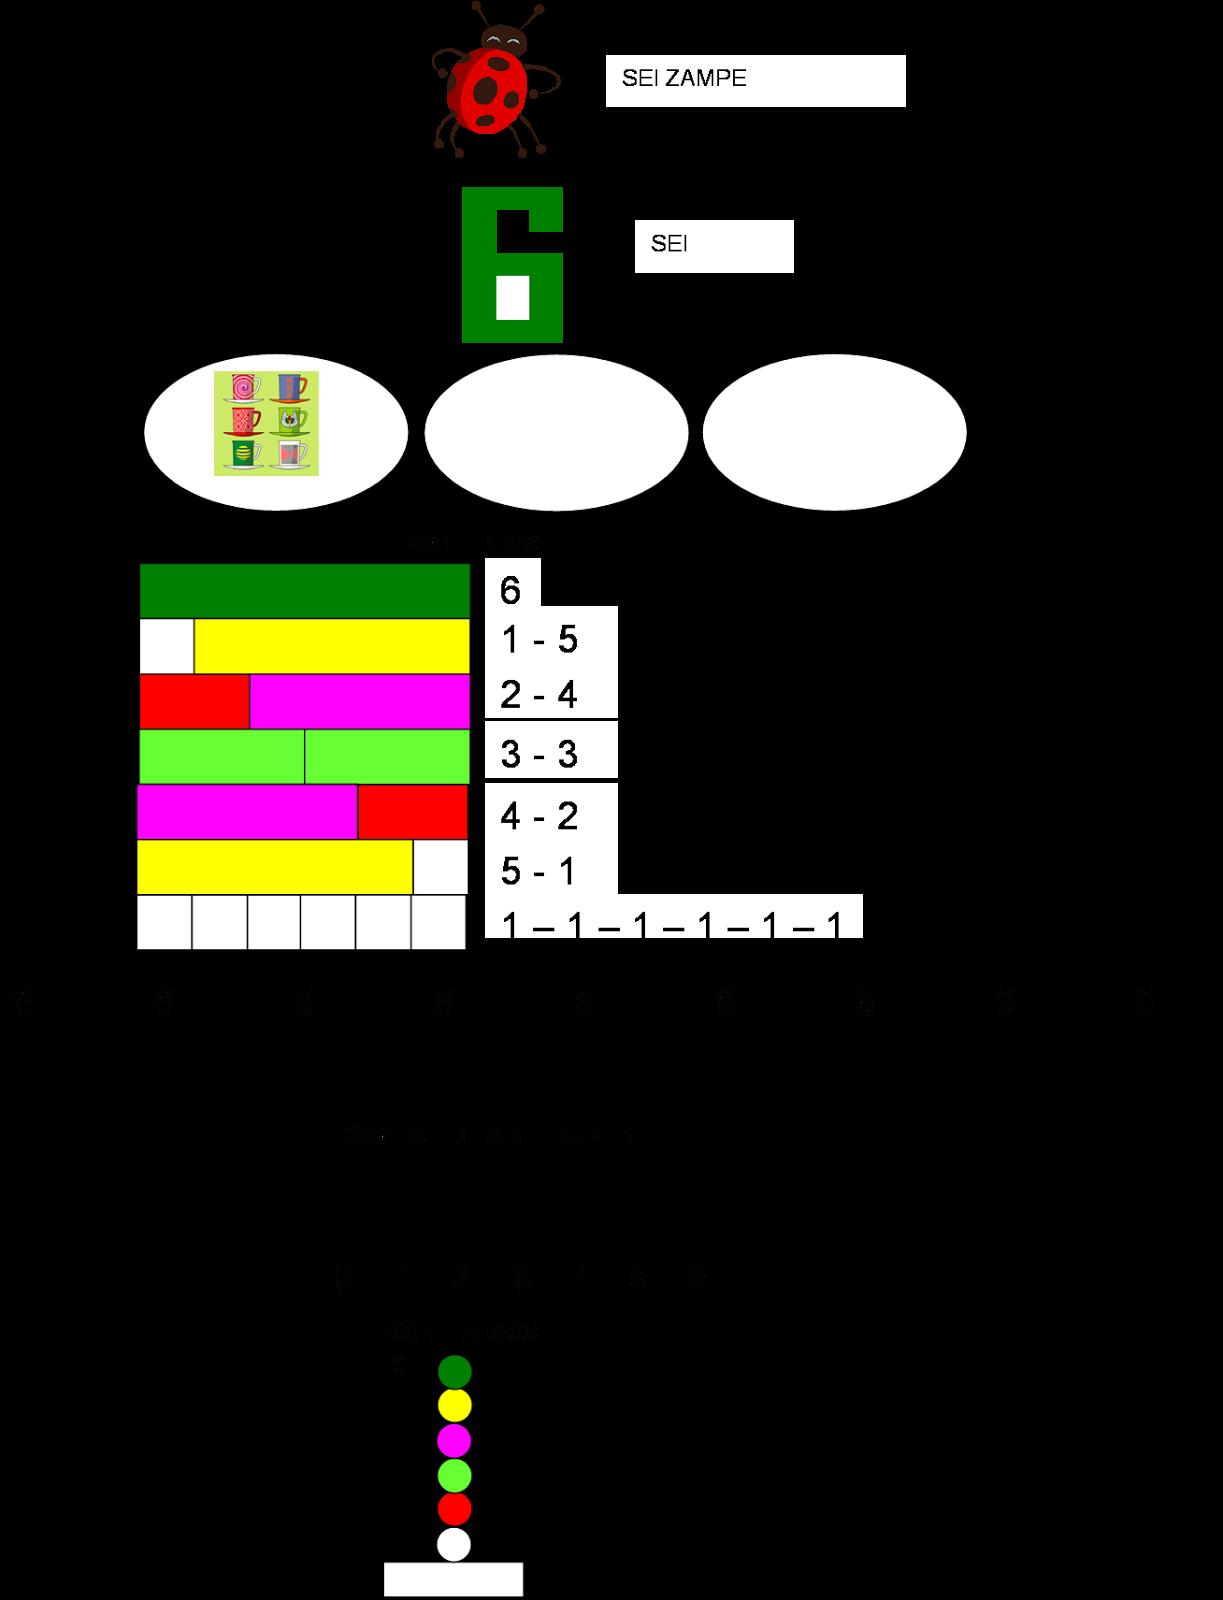 didattica matematica scuola primaria i numeri da 0 a 9 classe prima. Black Bedroom Furniture Sets. Home Design Ideas